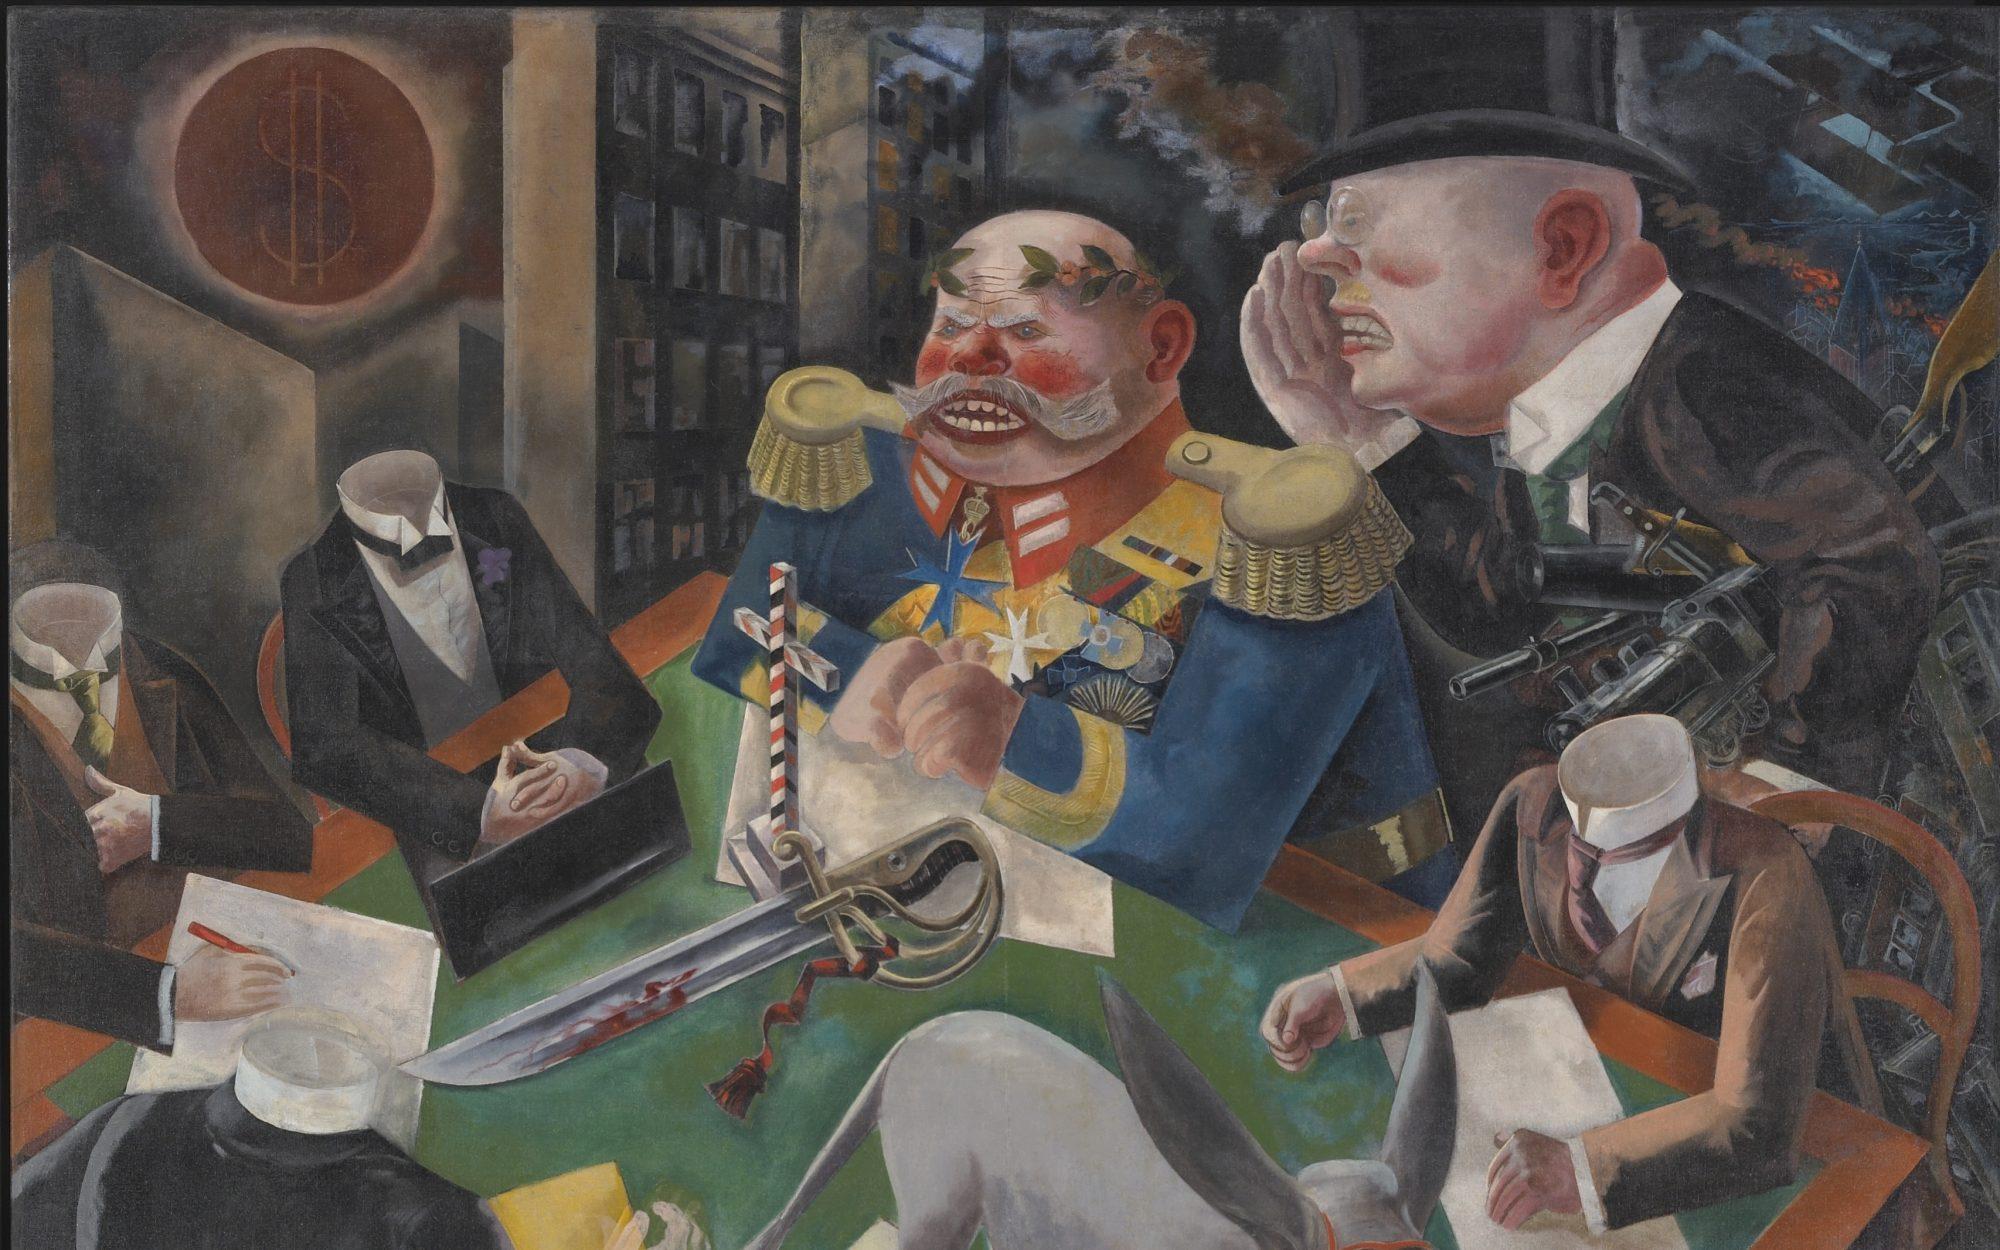 The Heckscher Museum Celebrates 100: Tracing History, Inspiring the Future